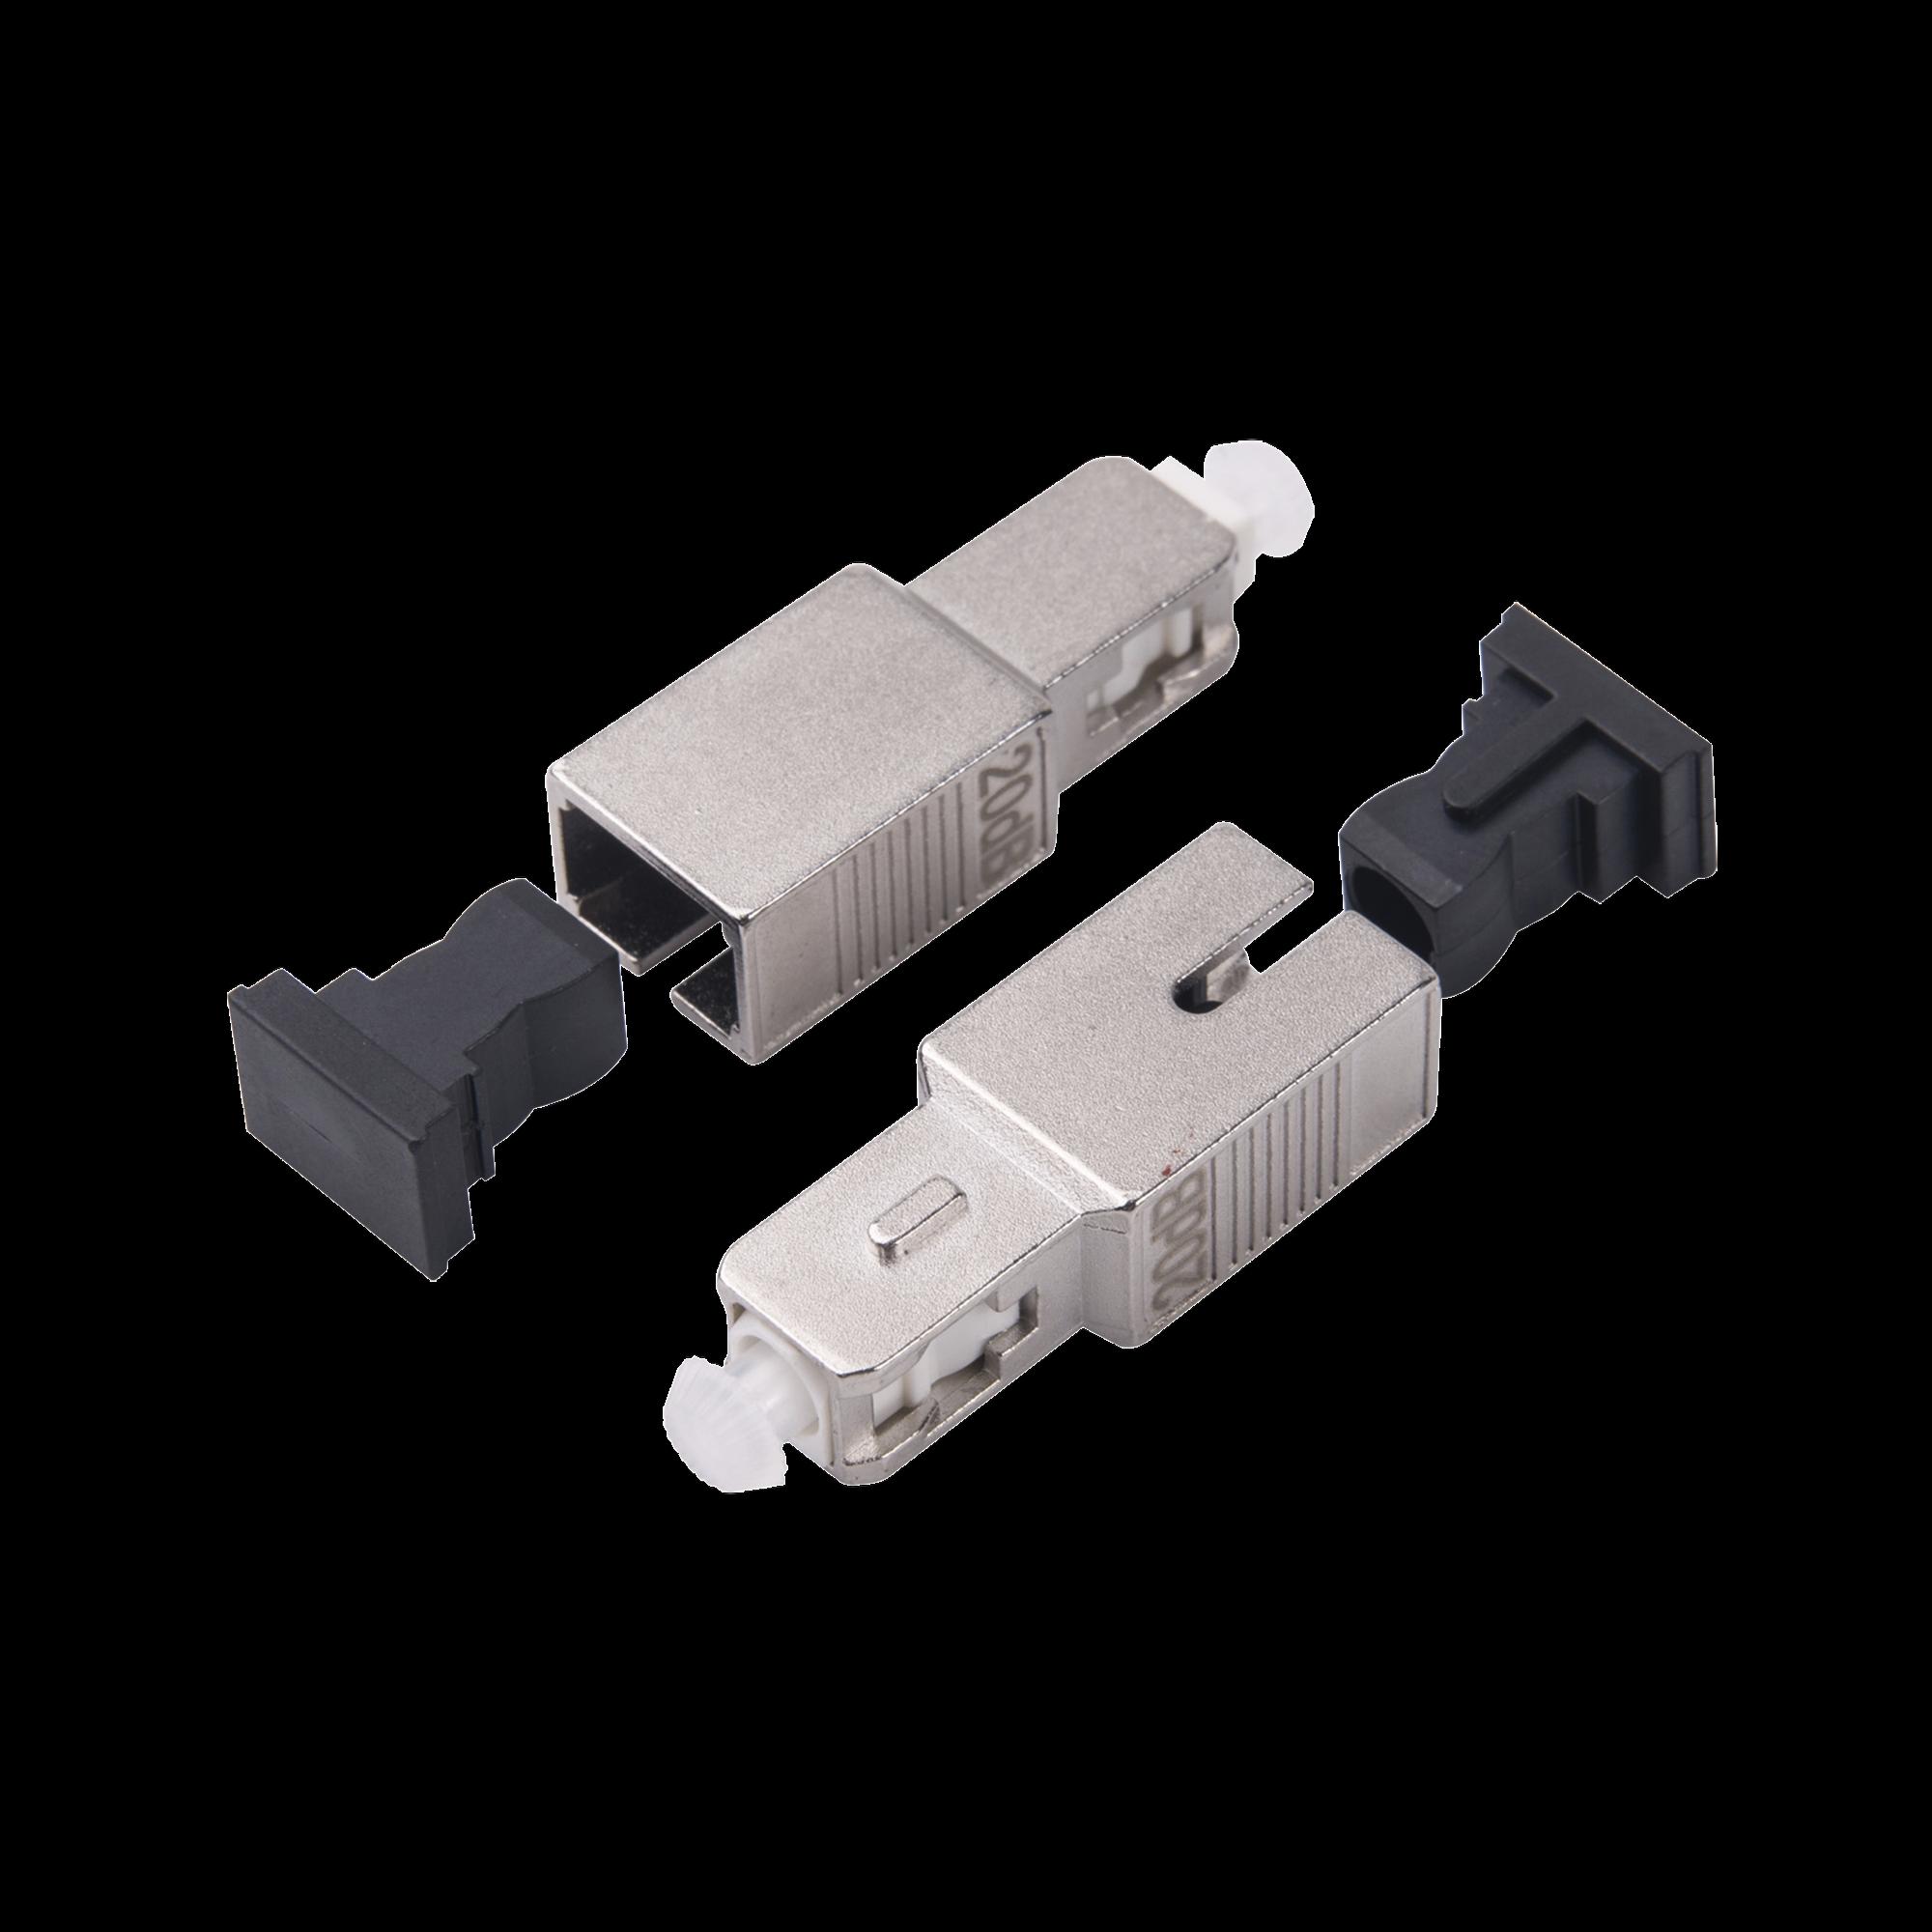 Atenuador óptico macho-hembra con conector SC/UPC de 15dB para fibra Monomodo